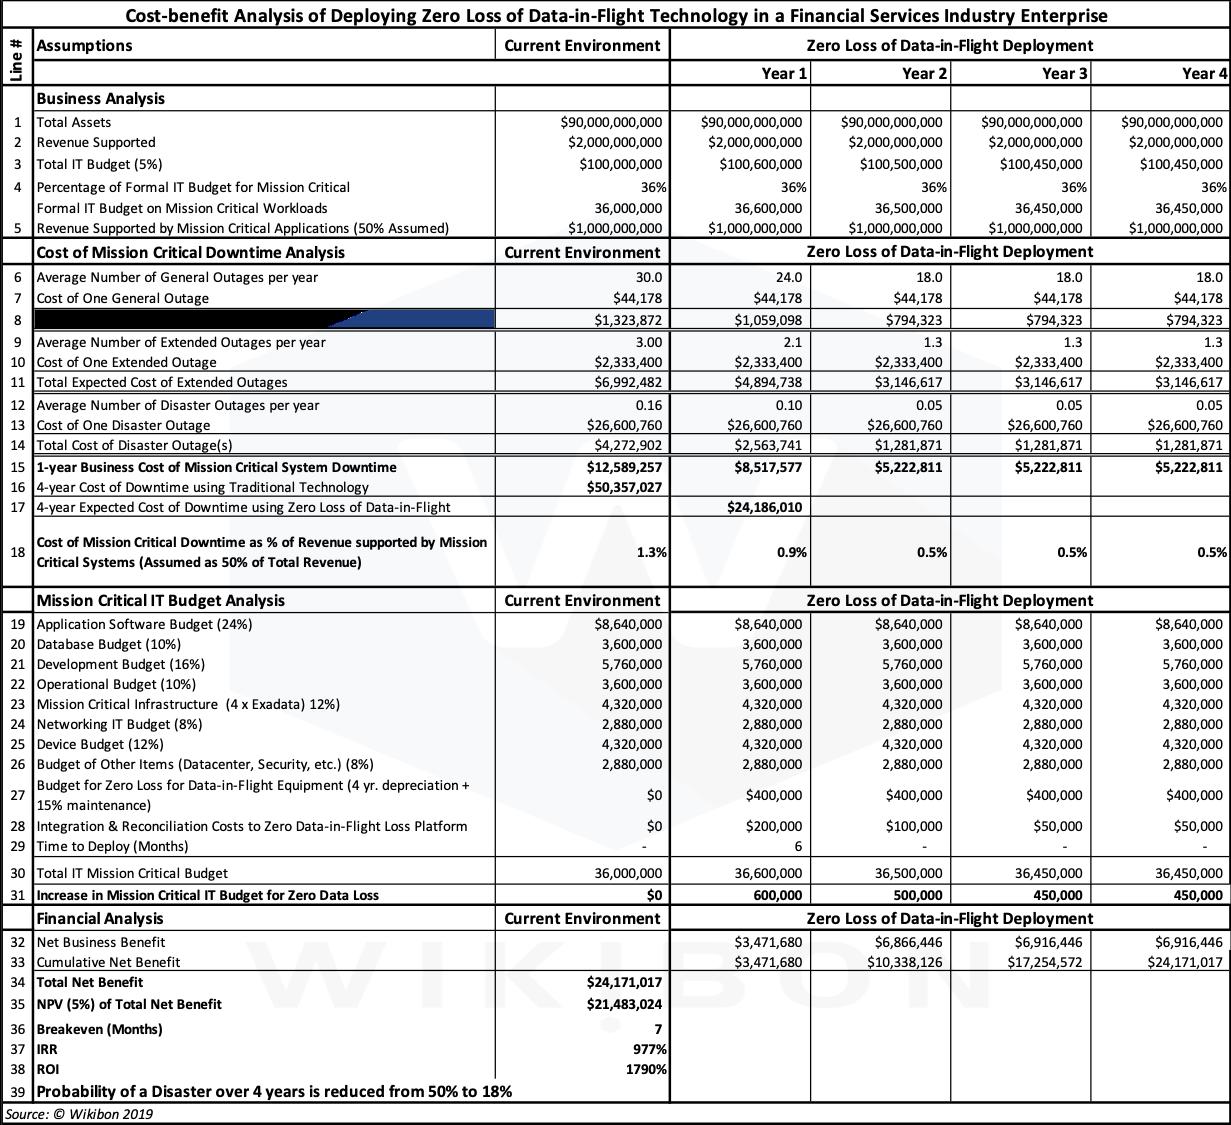 Cost-benefit Analysis Model